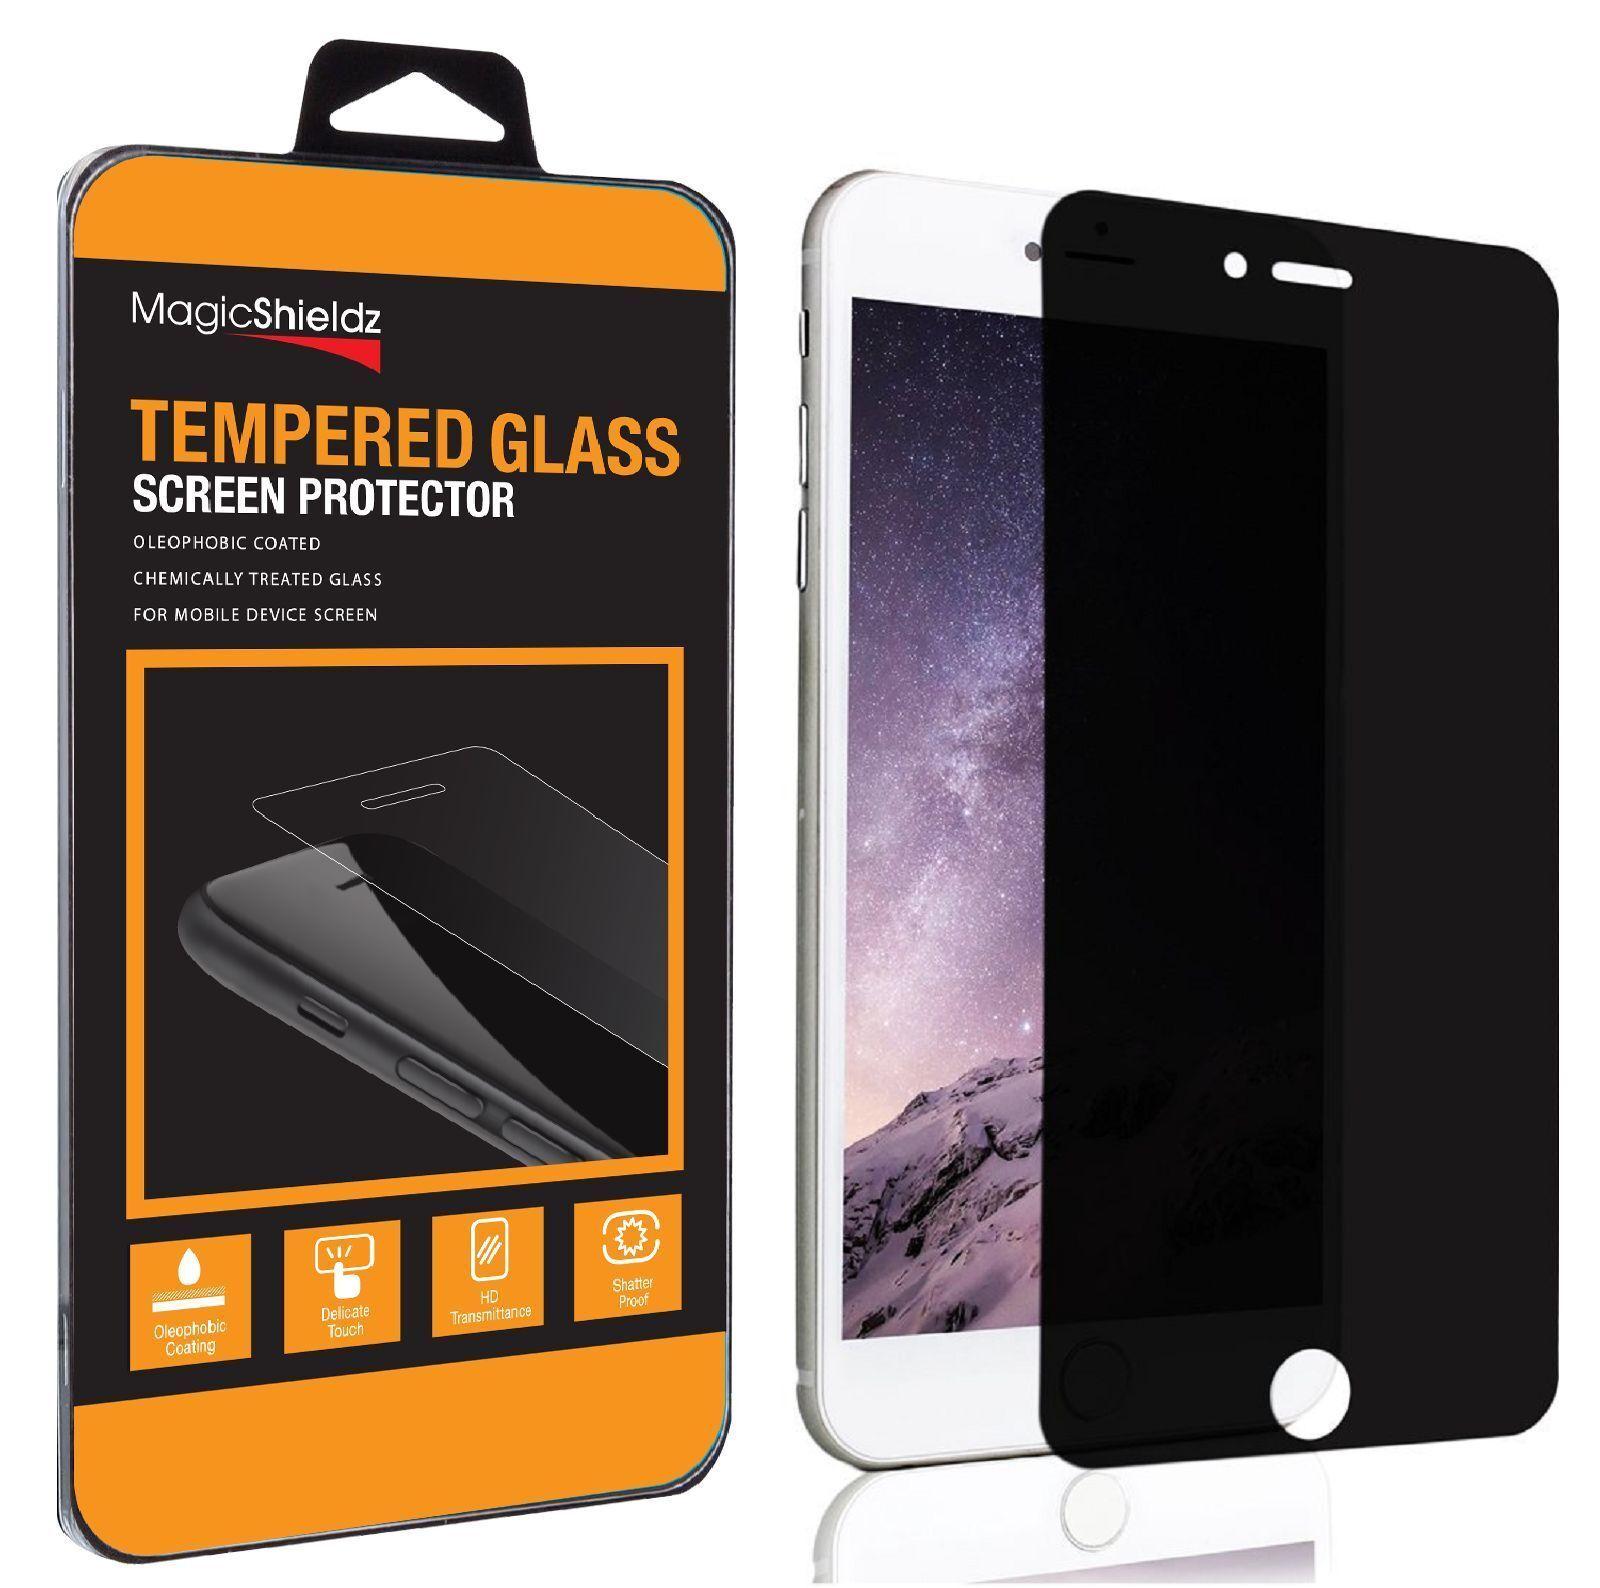 Купить MagicShieldz® - 9H Privacy Anti-Spy Tempered Glass Screen Protector for iPhone X 6 6s 7 8 Plus